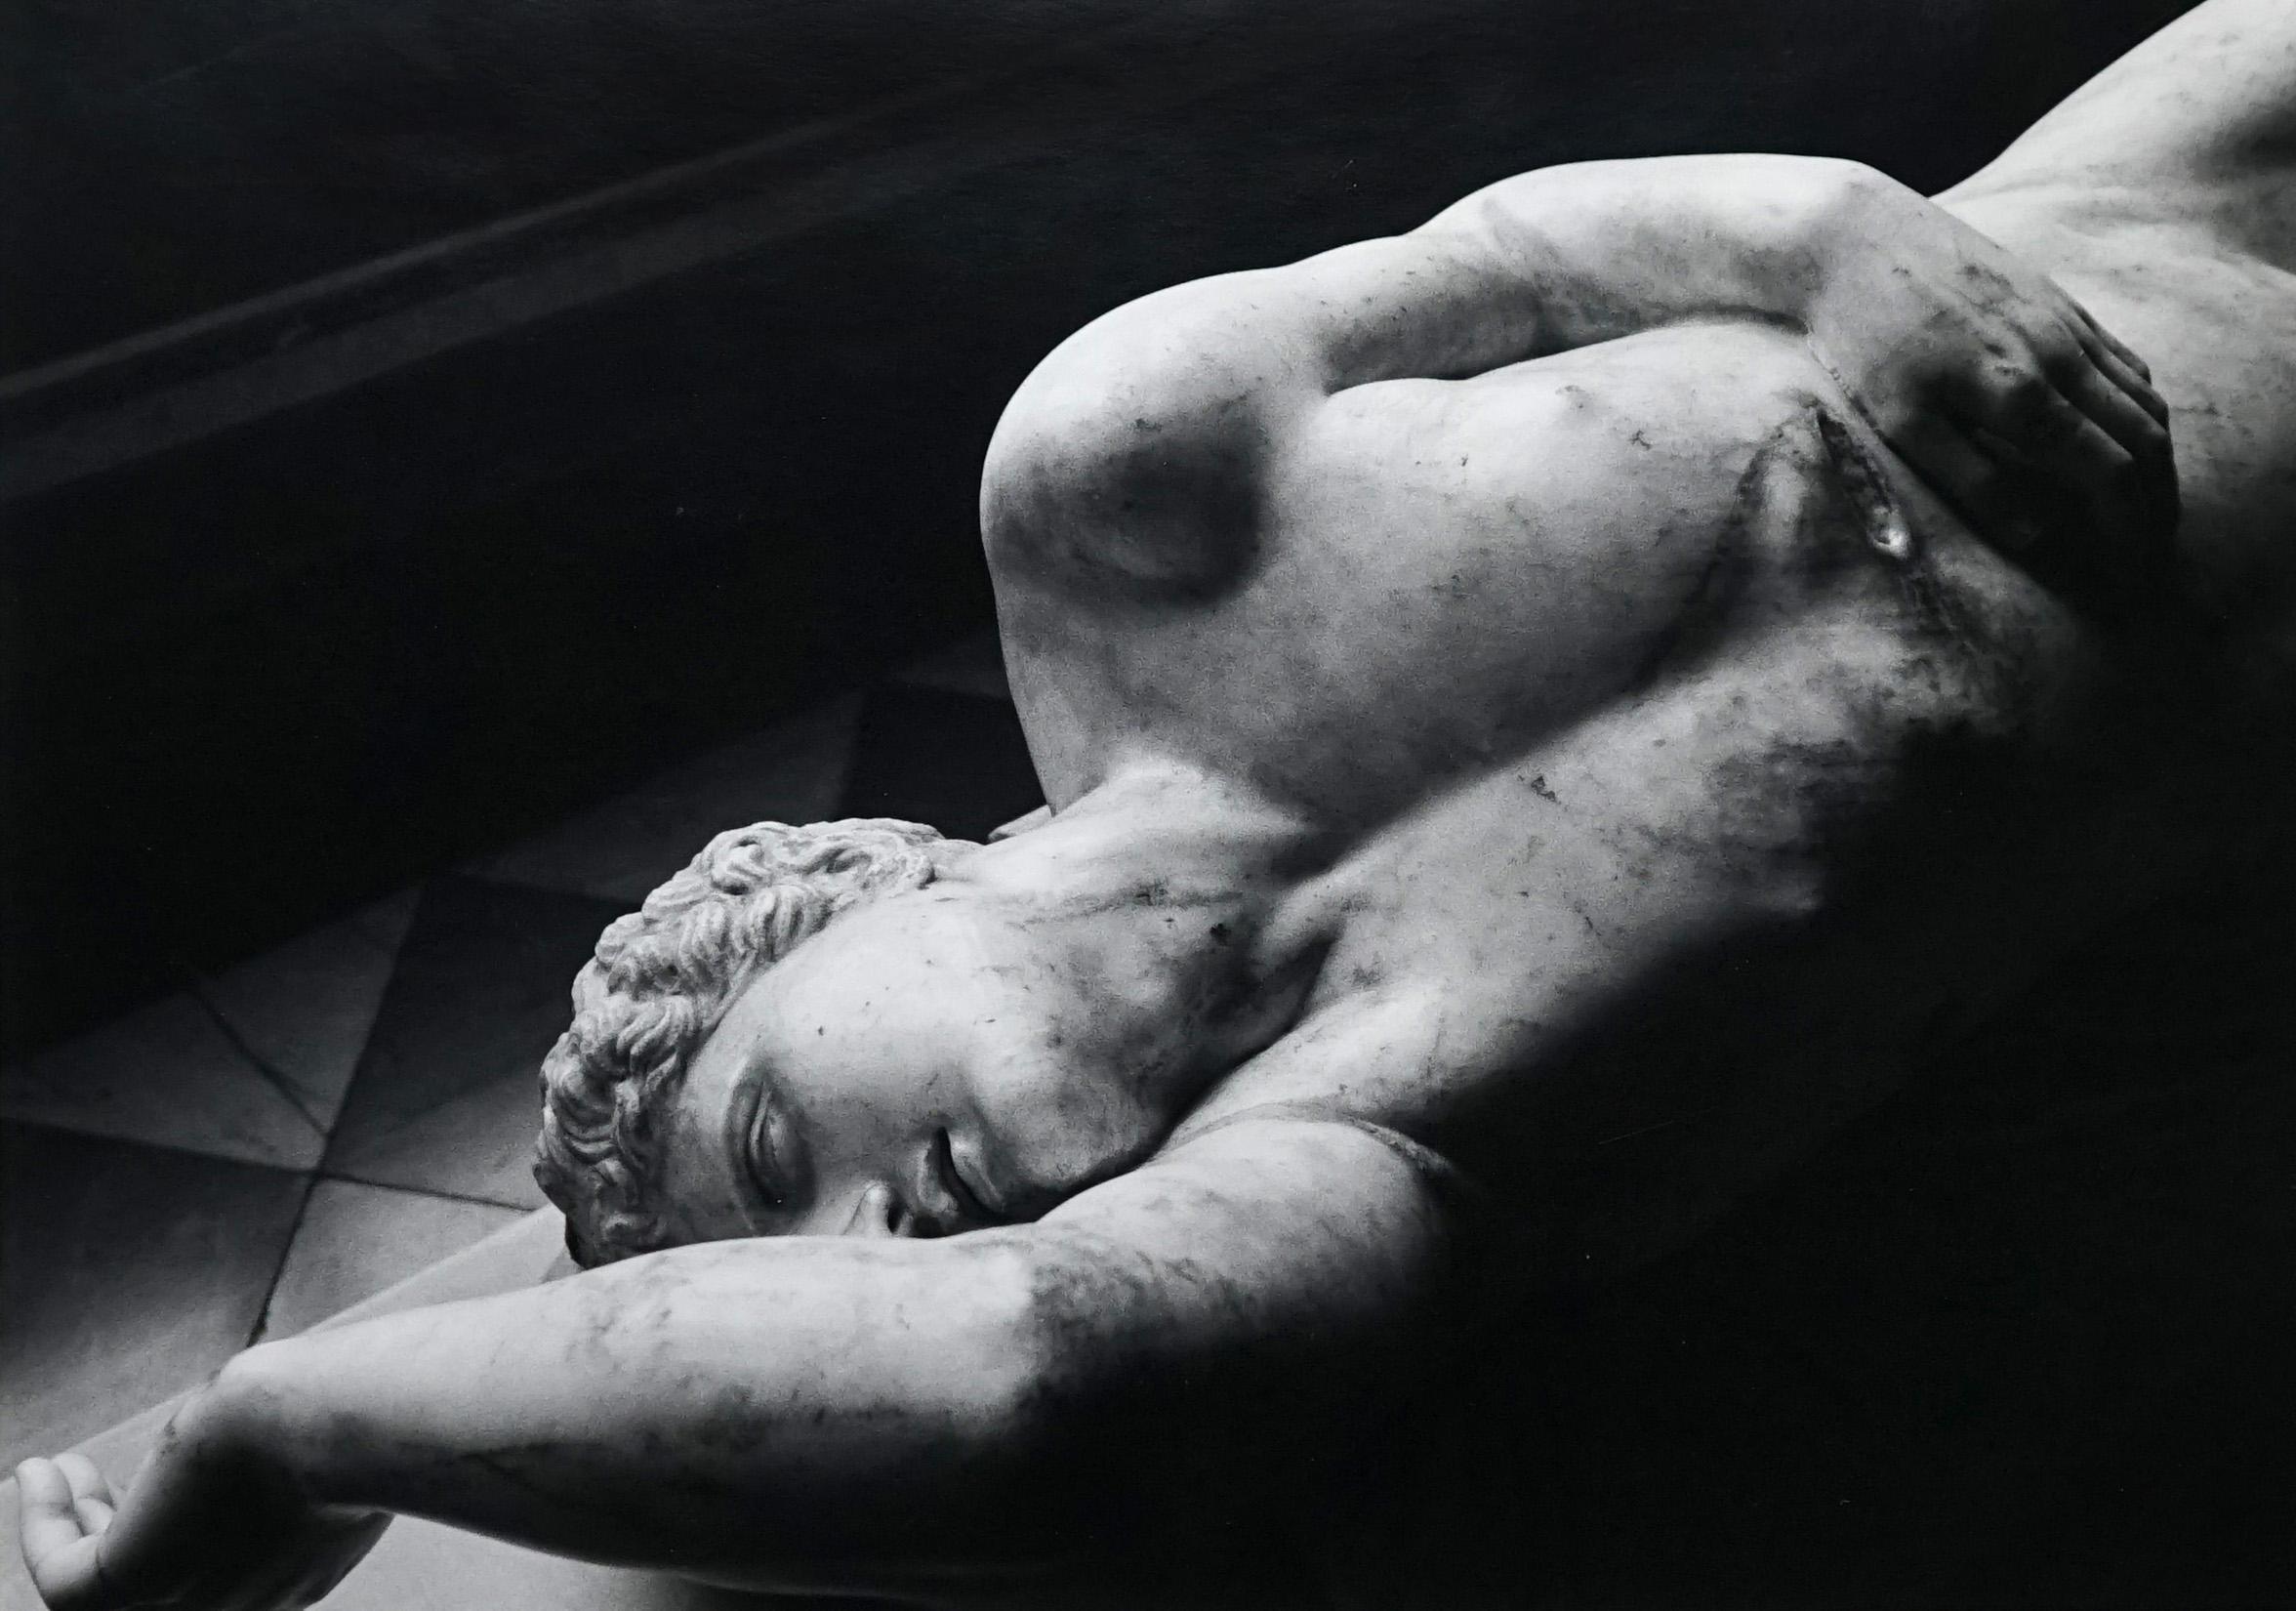 Statuary - Off-Print # 2 - 1976 - Minimalist Black & White Photography